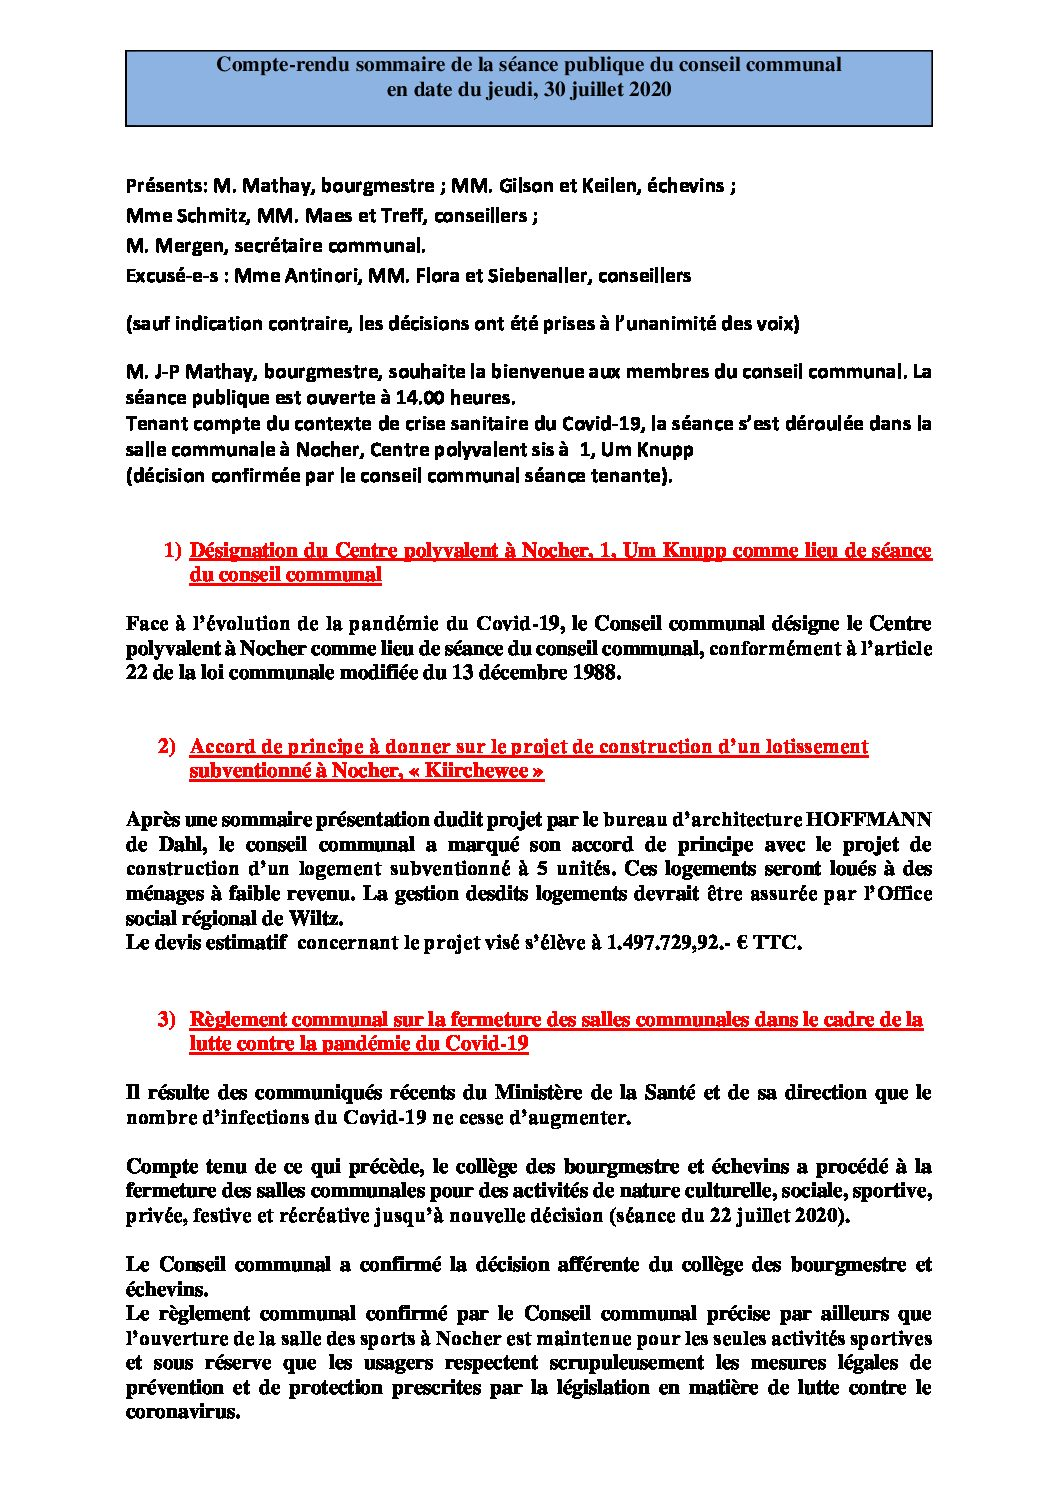 Rapport séance publique conseil communal jeudi 30 07 2020